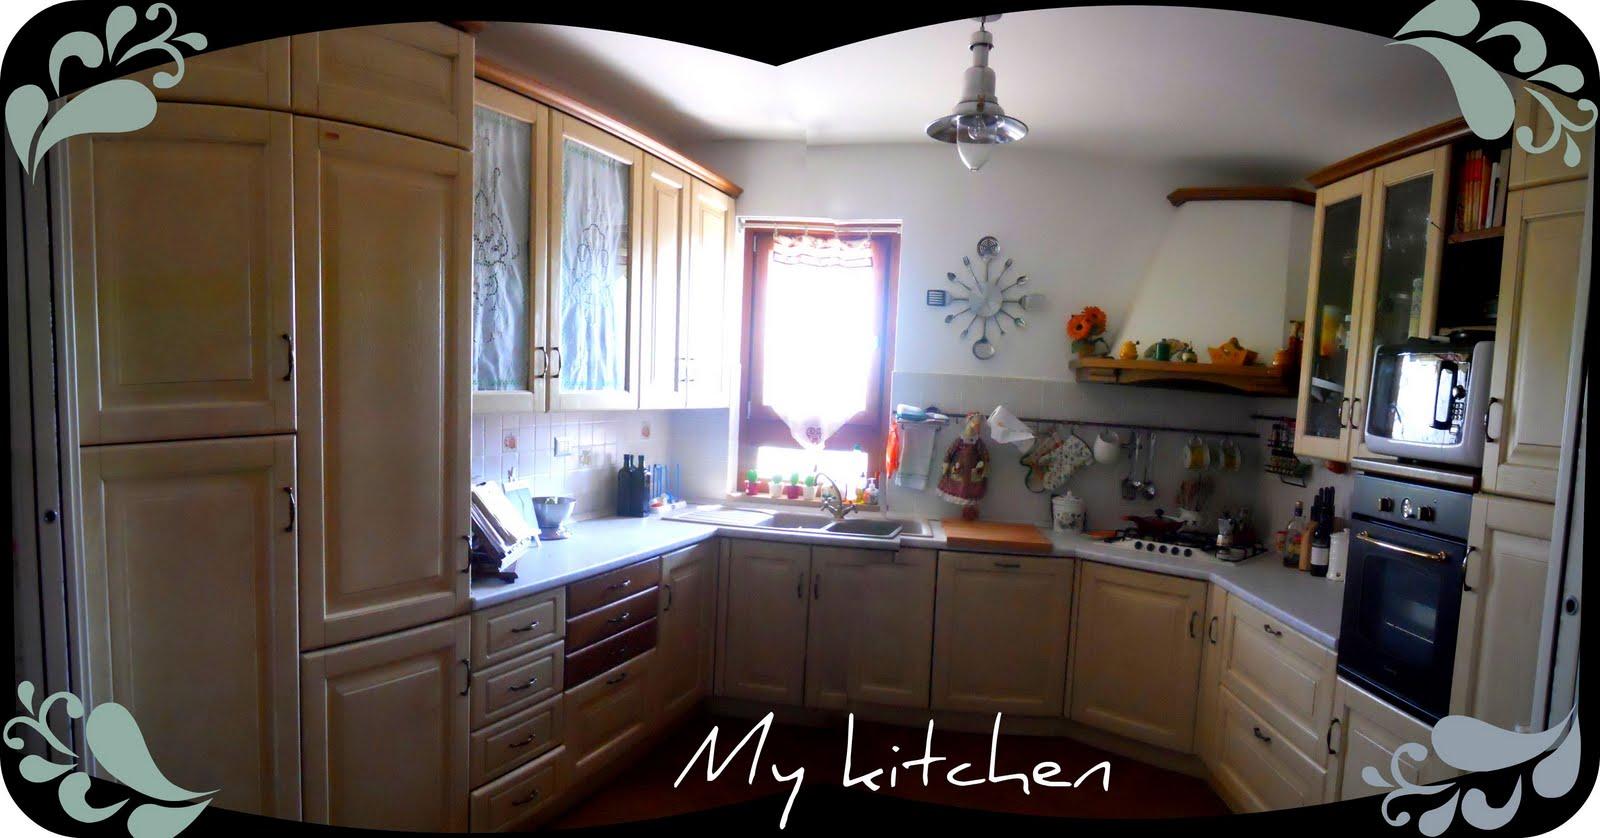 Apple Pie and Shabby Style: La mia cucina.